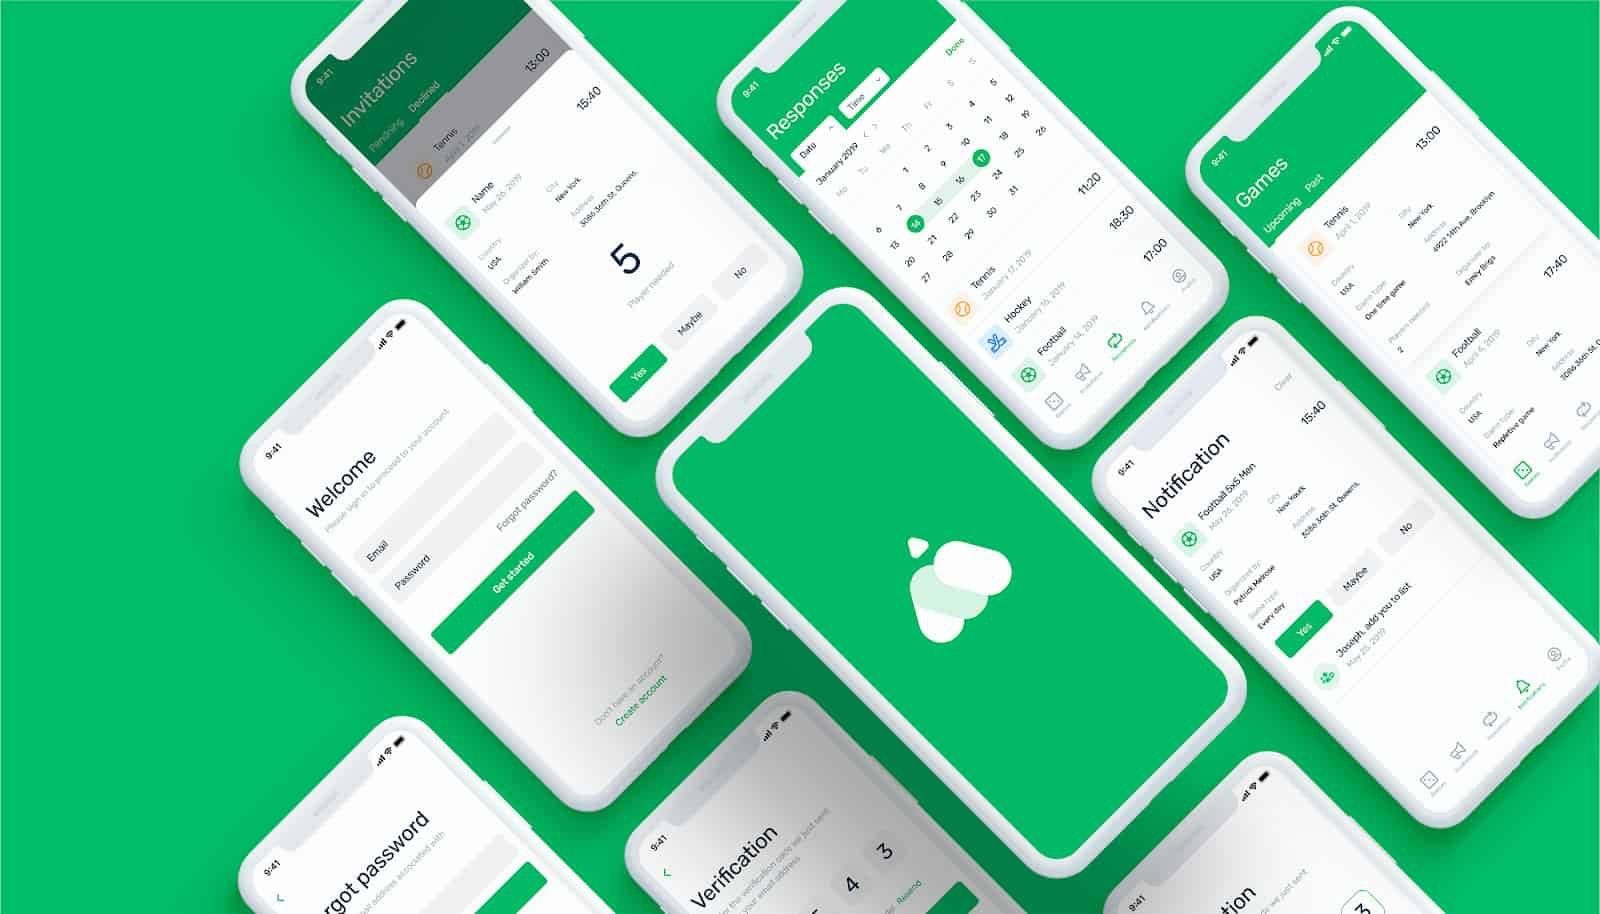 Create an App Mockup Manrim